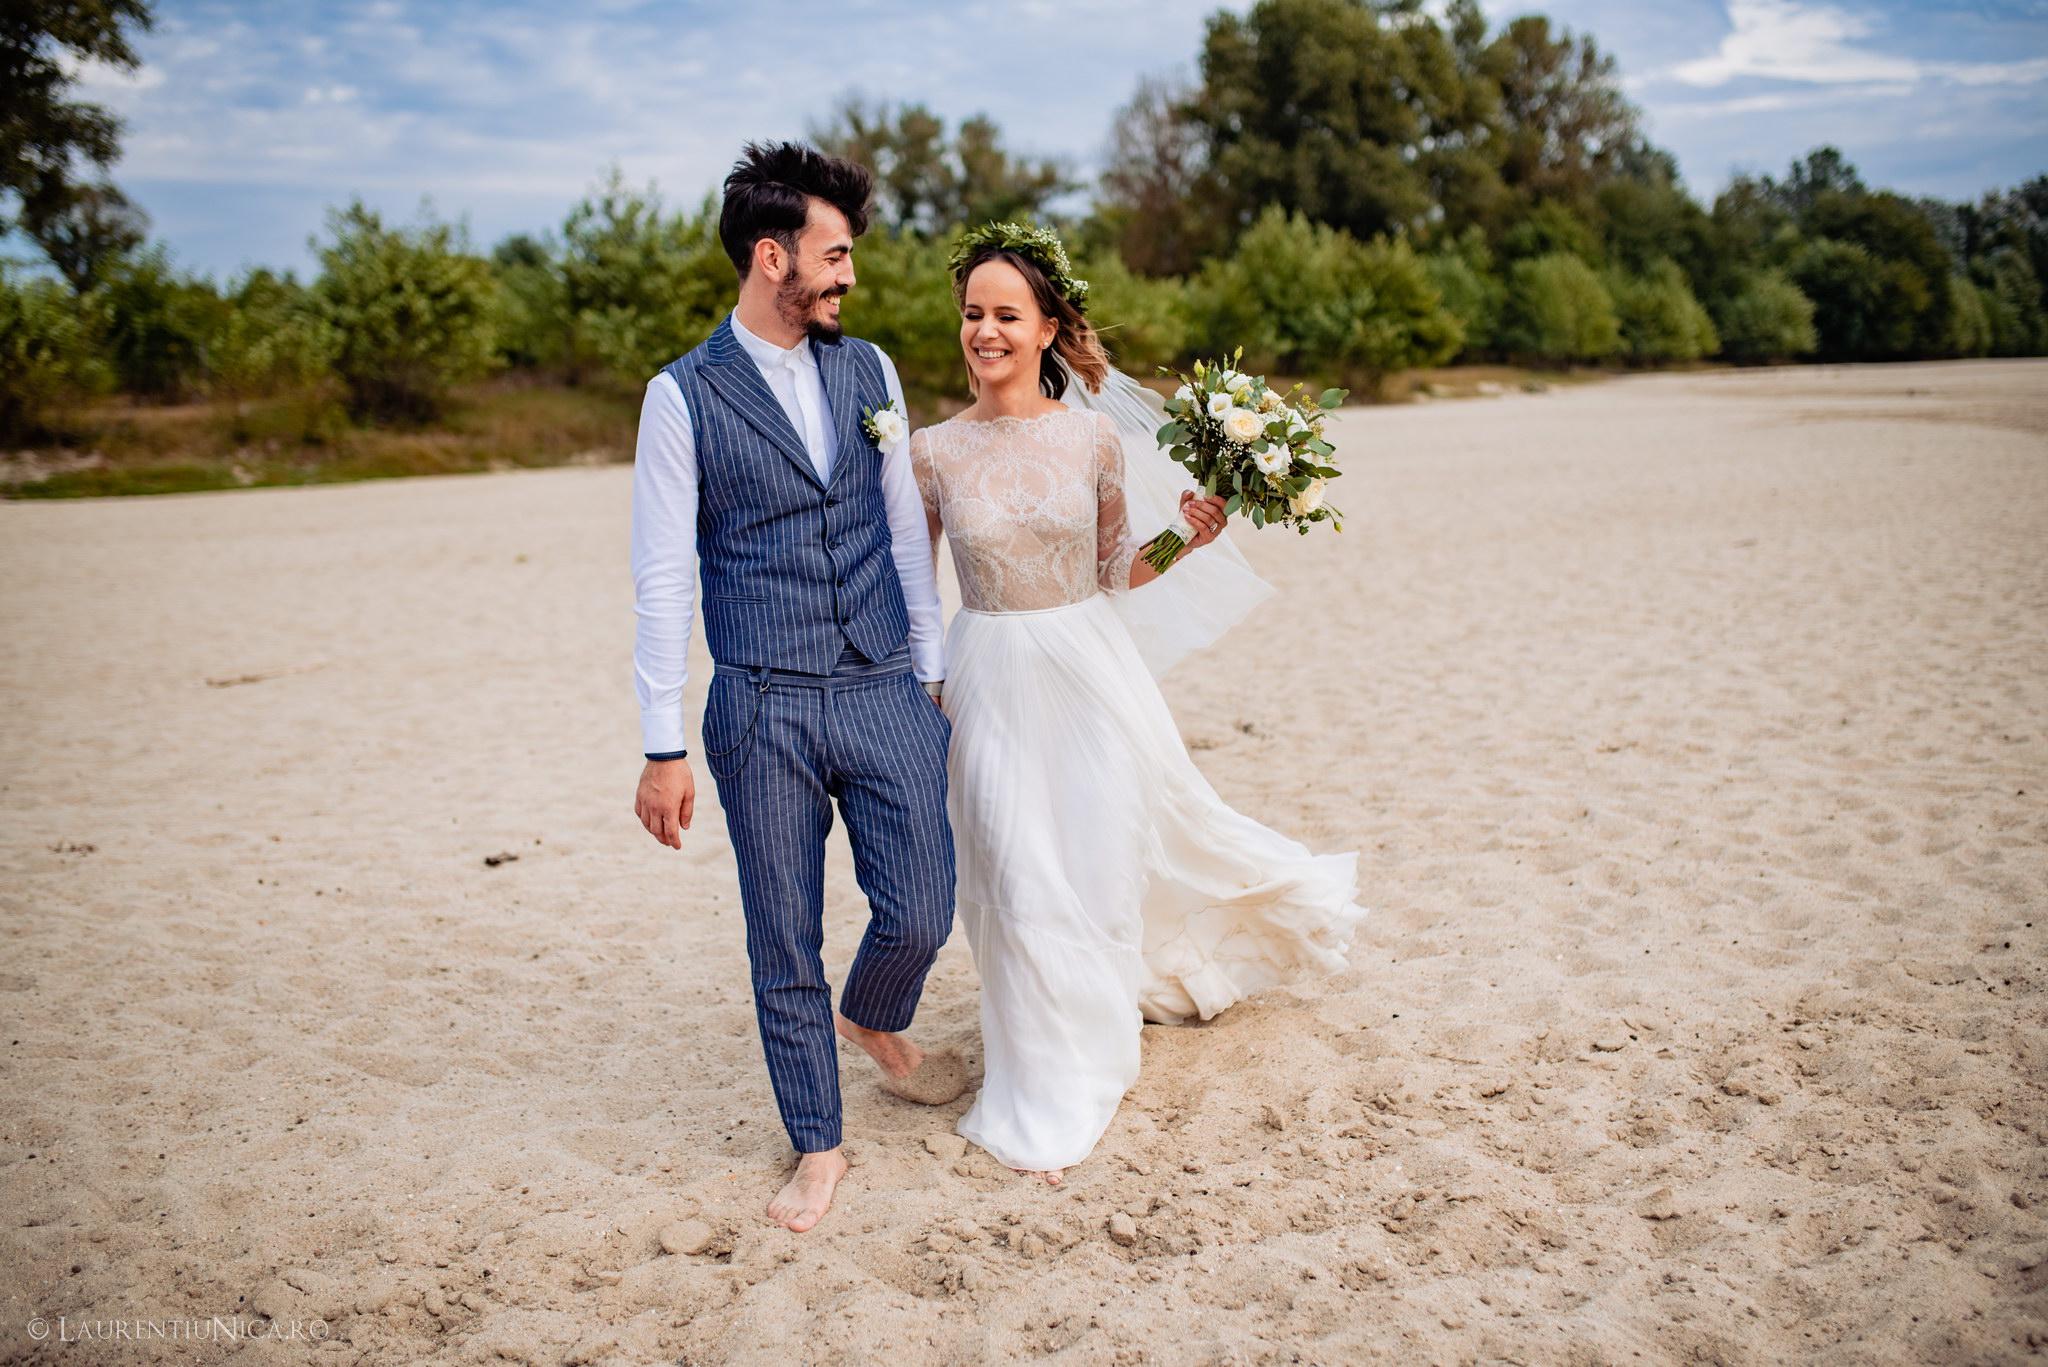 20180915 LN 0545 - Diana & Marius | Fotografii nunta | Slatina